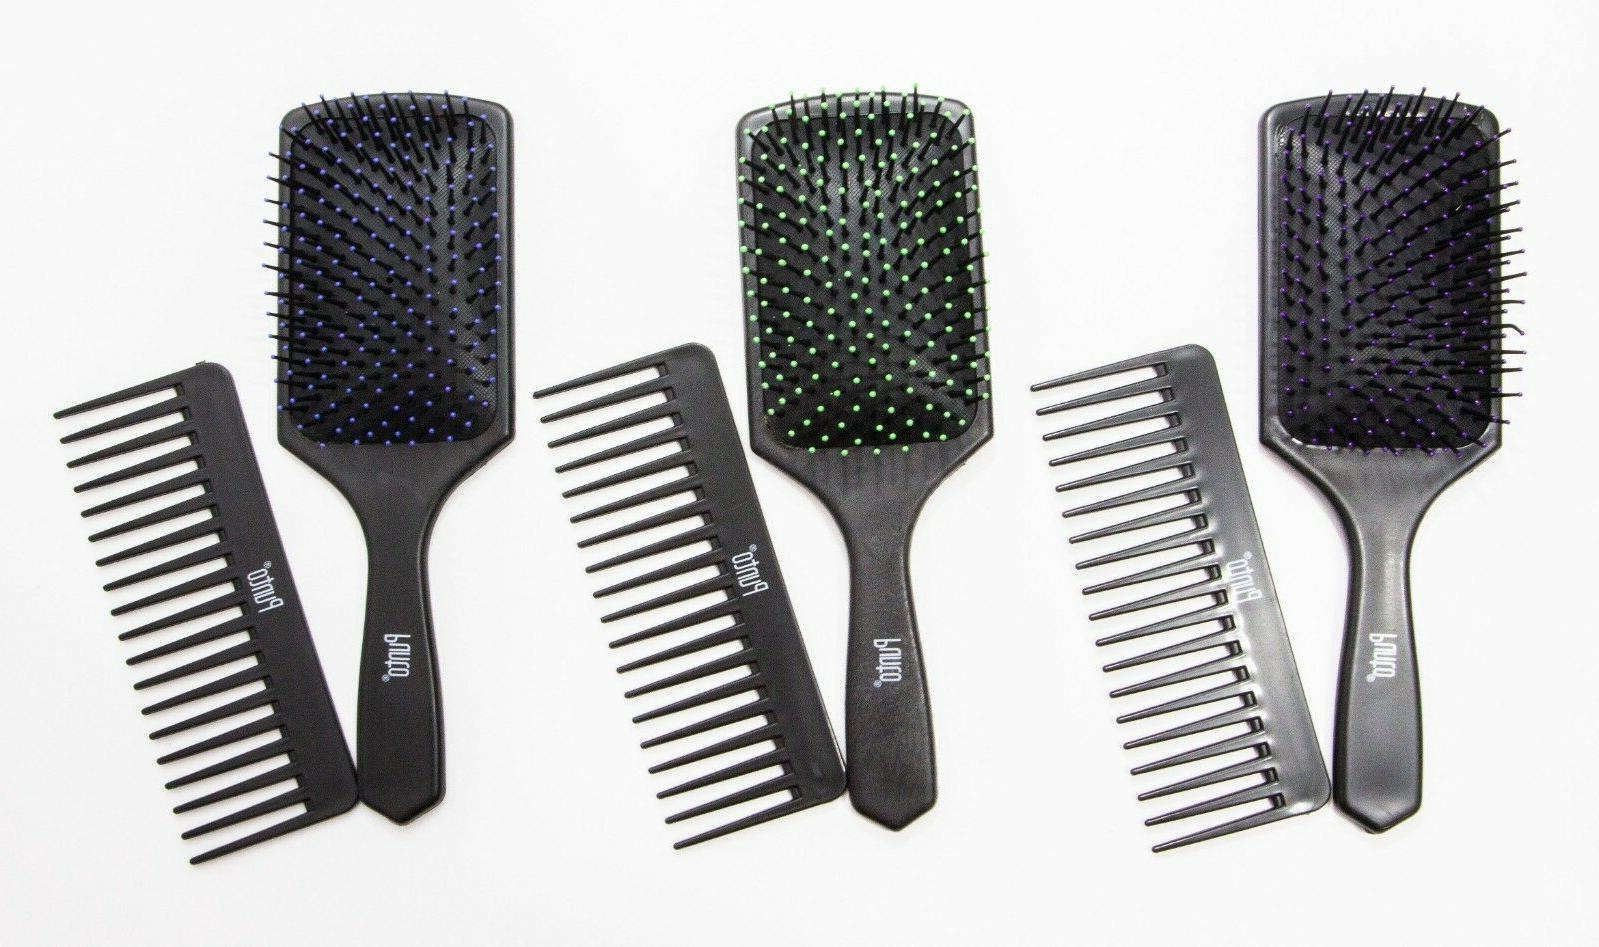 brand new pro soft paddle hair brush